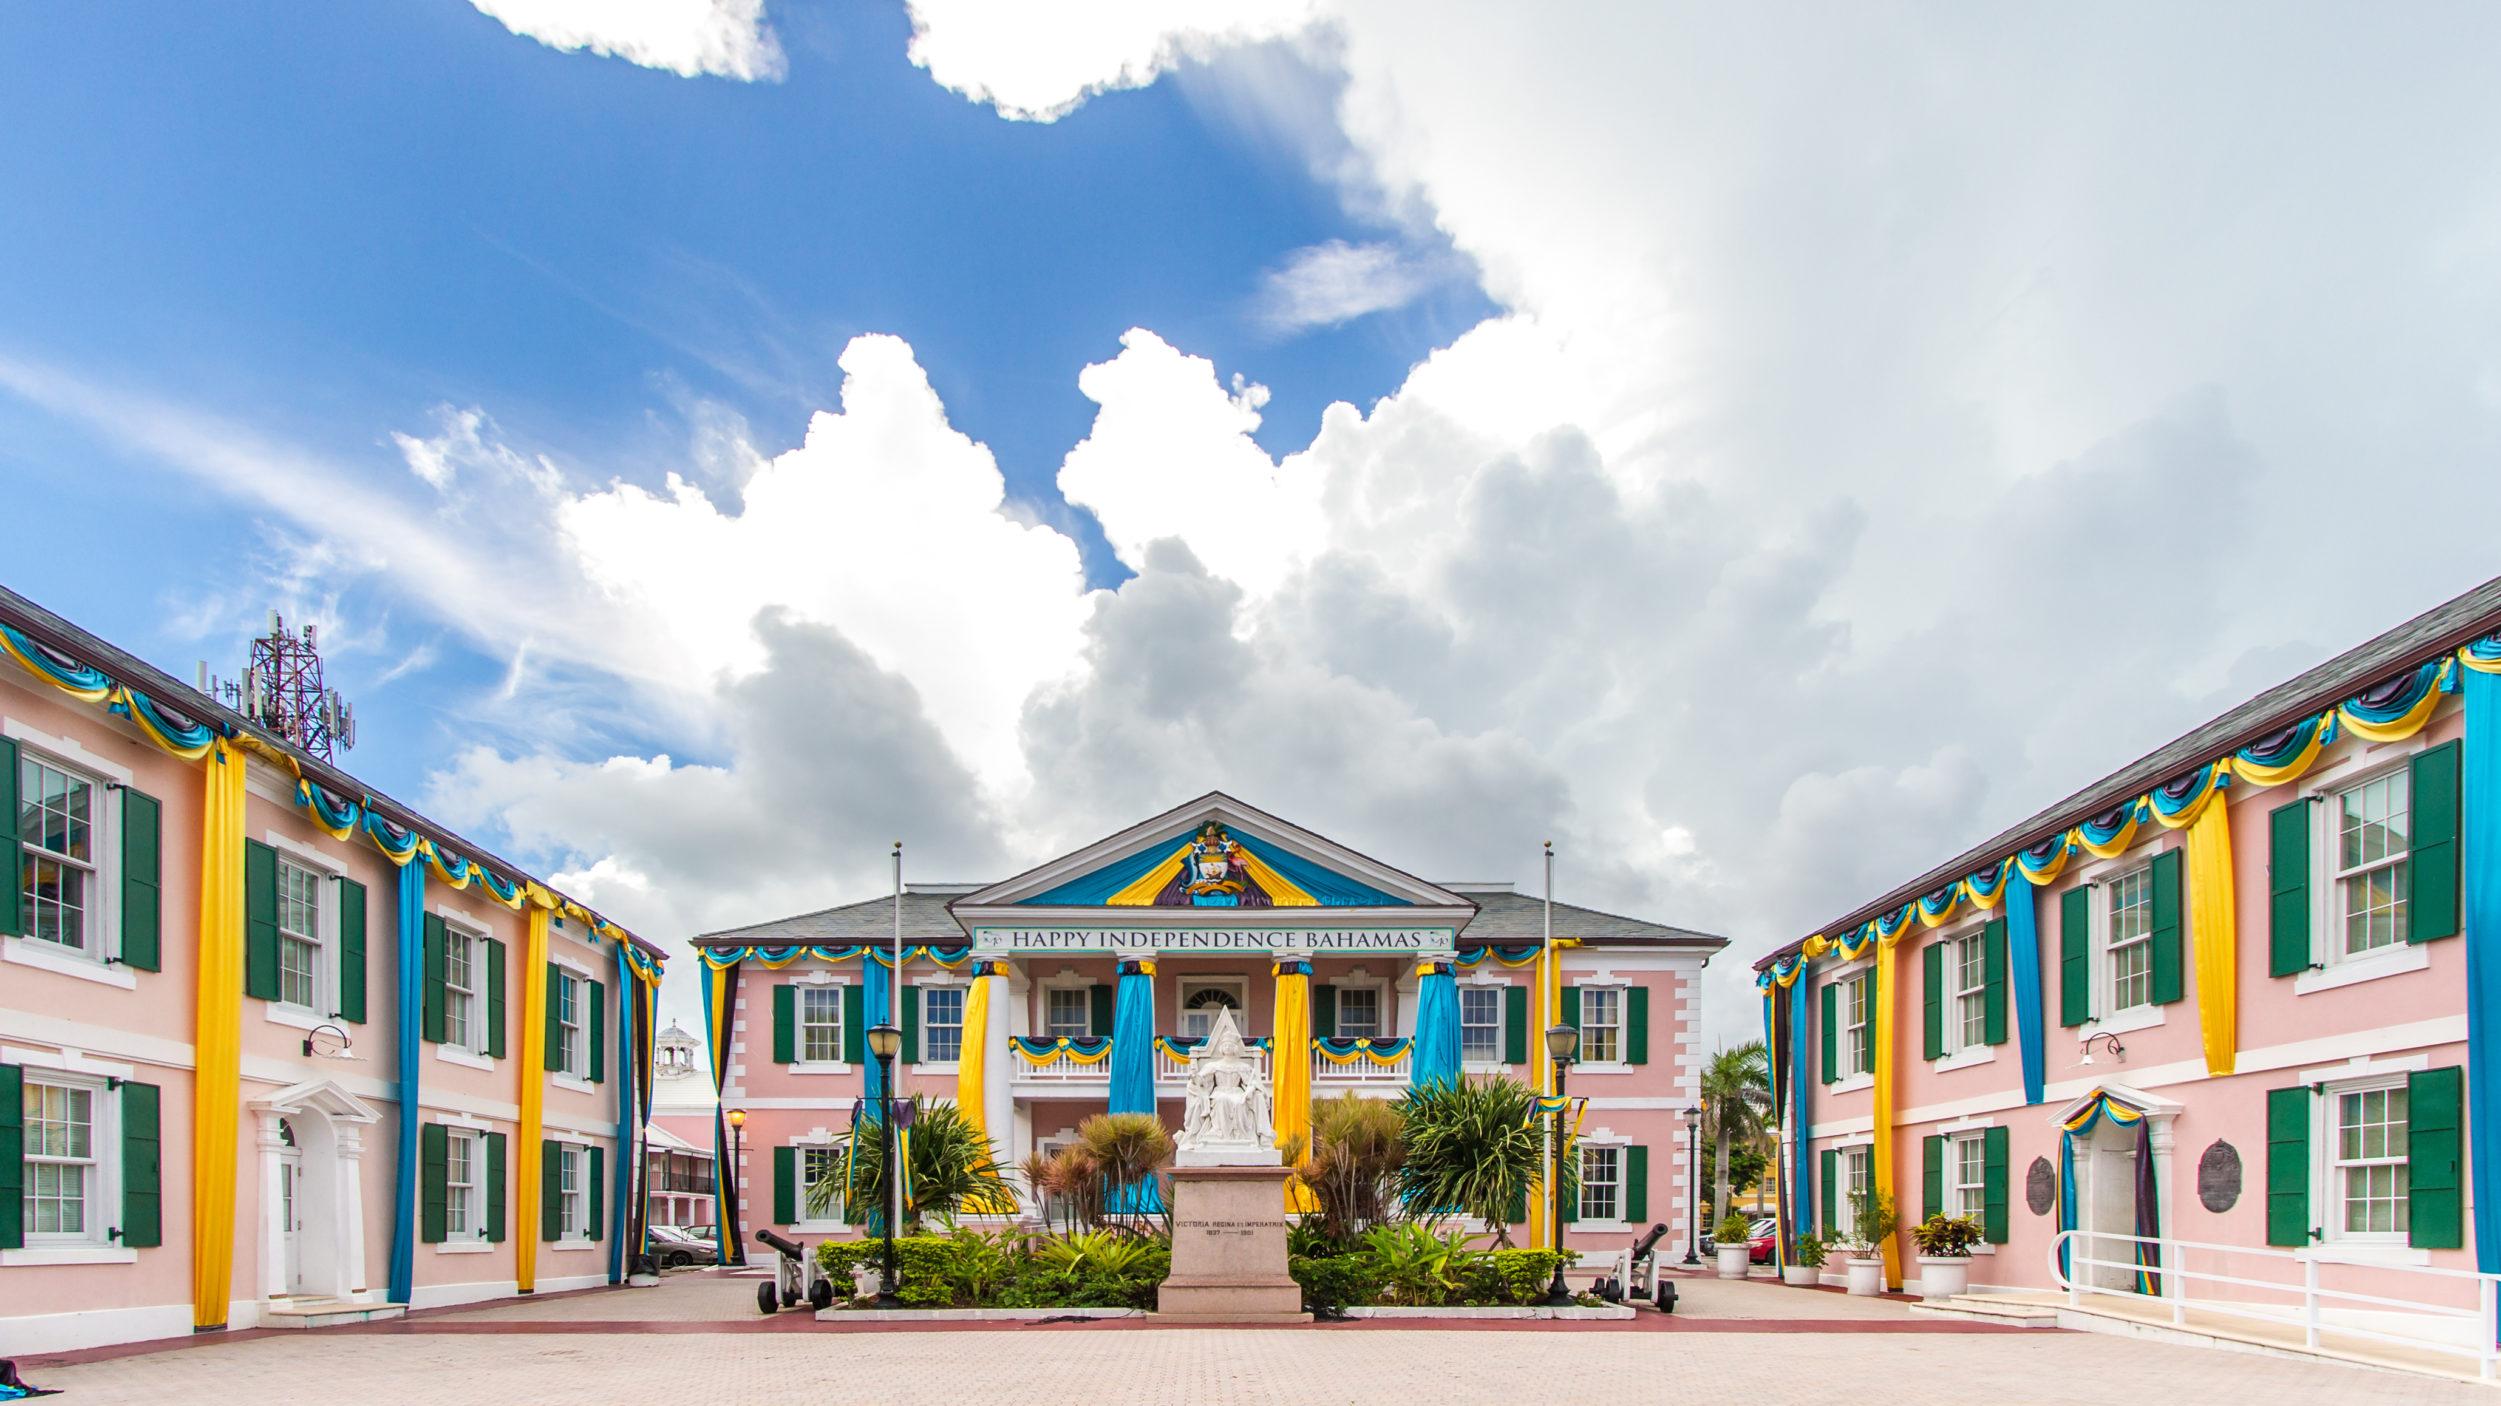 Bahamas [Shutterstock]